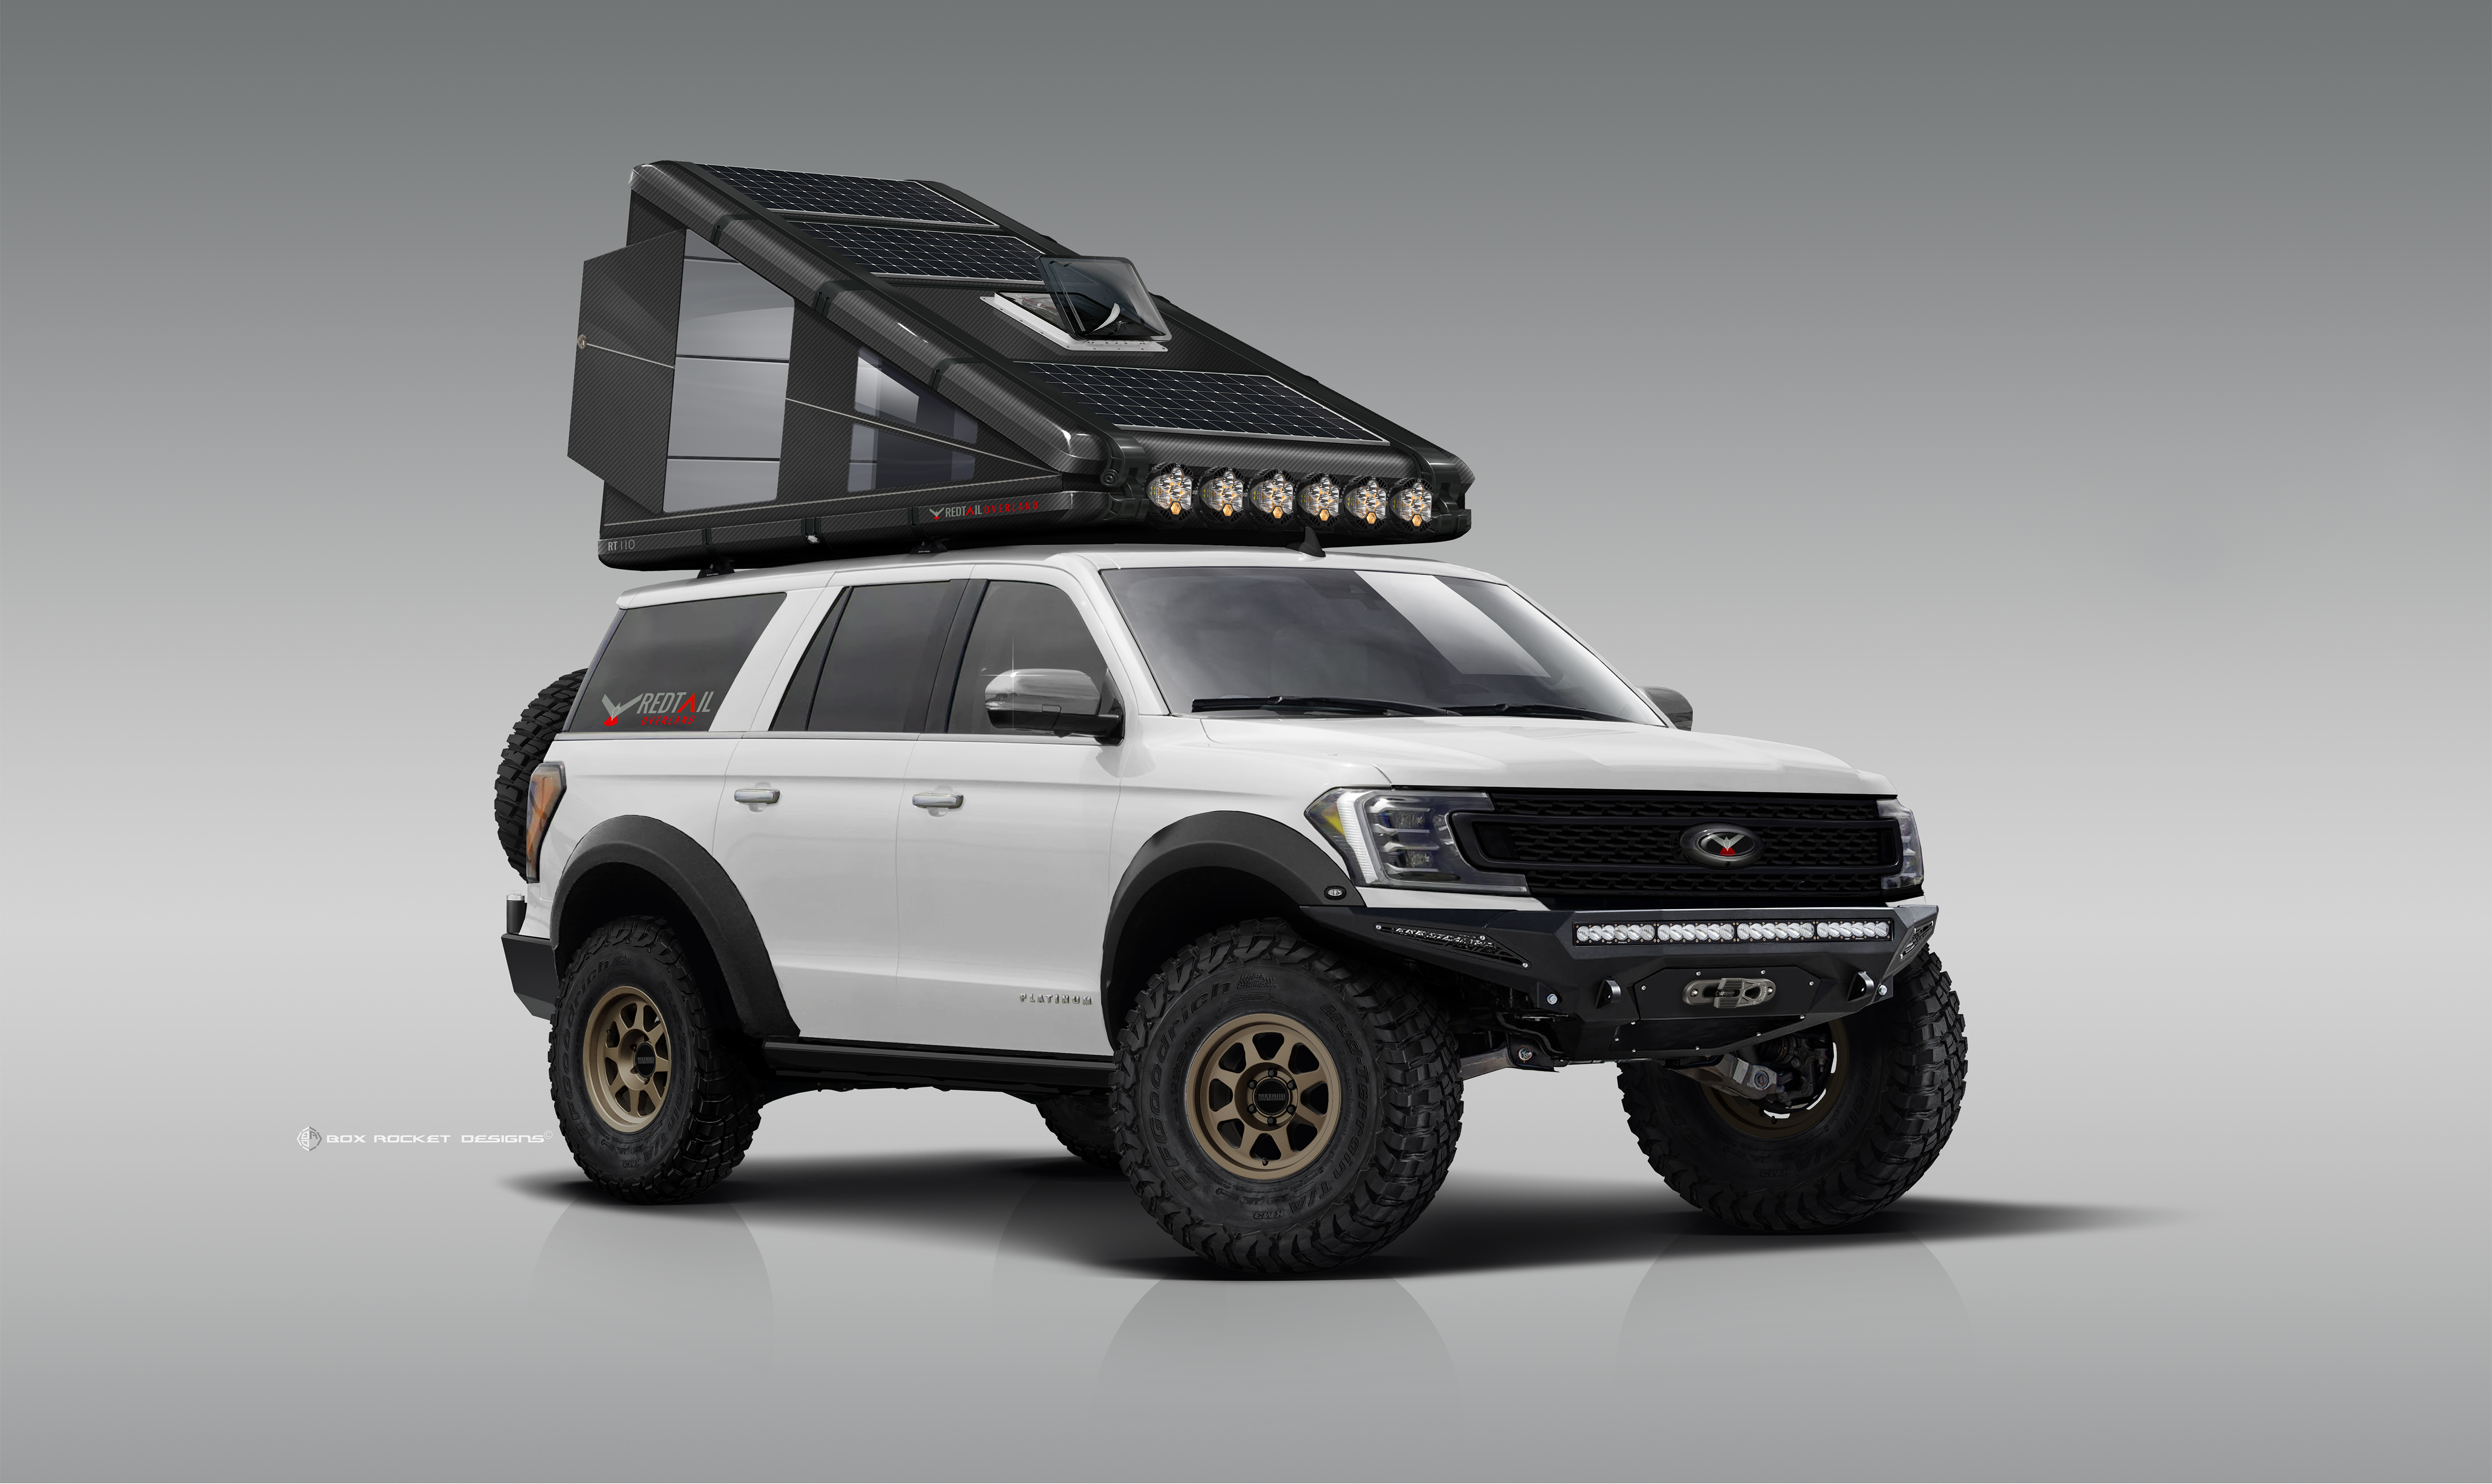 Best Rooftop Camper? Meet the Redtail Overland RT | GearJunkie